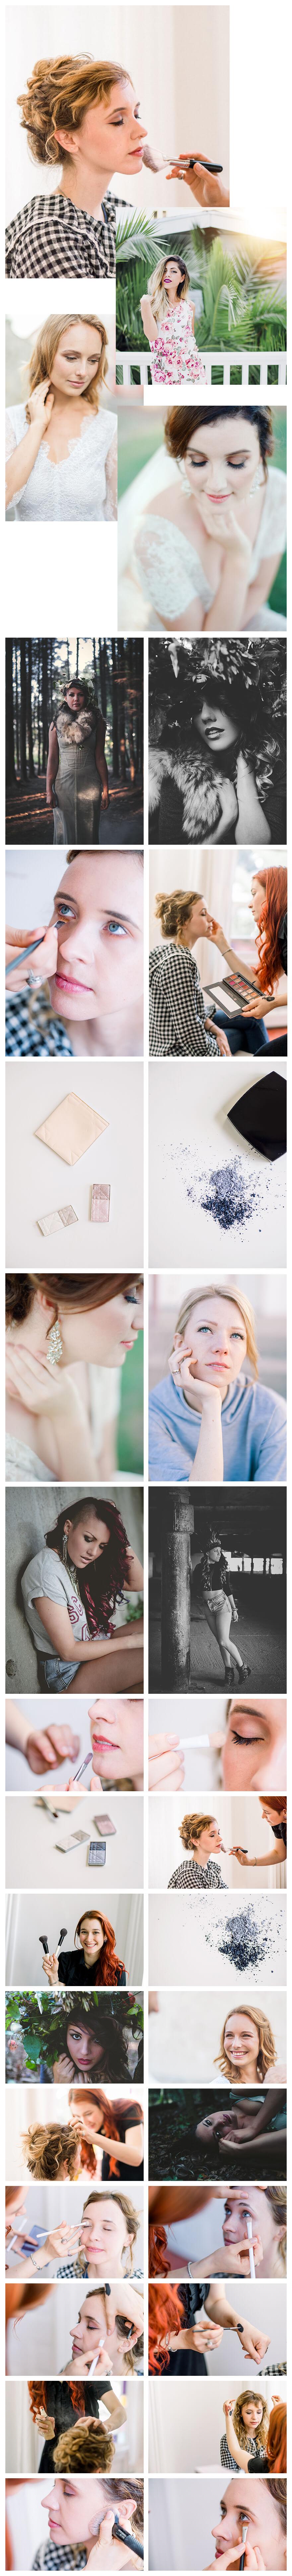 Divi Makeup Artist fotografie